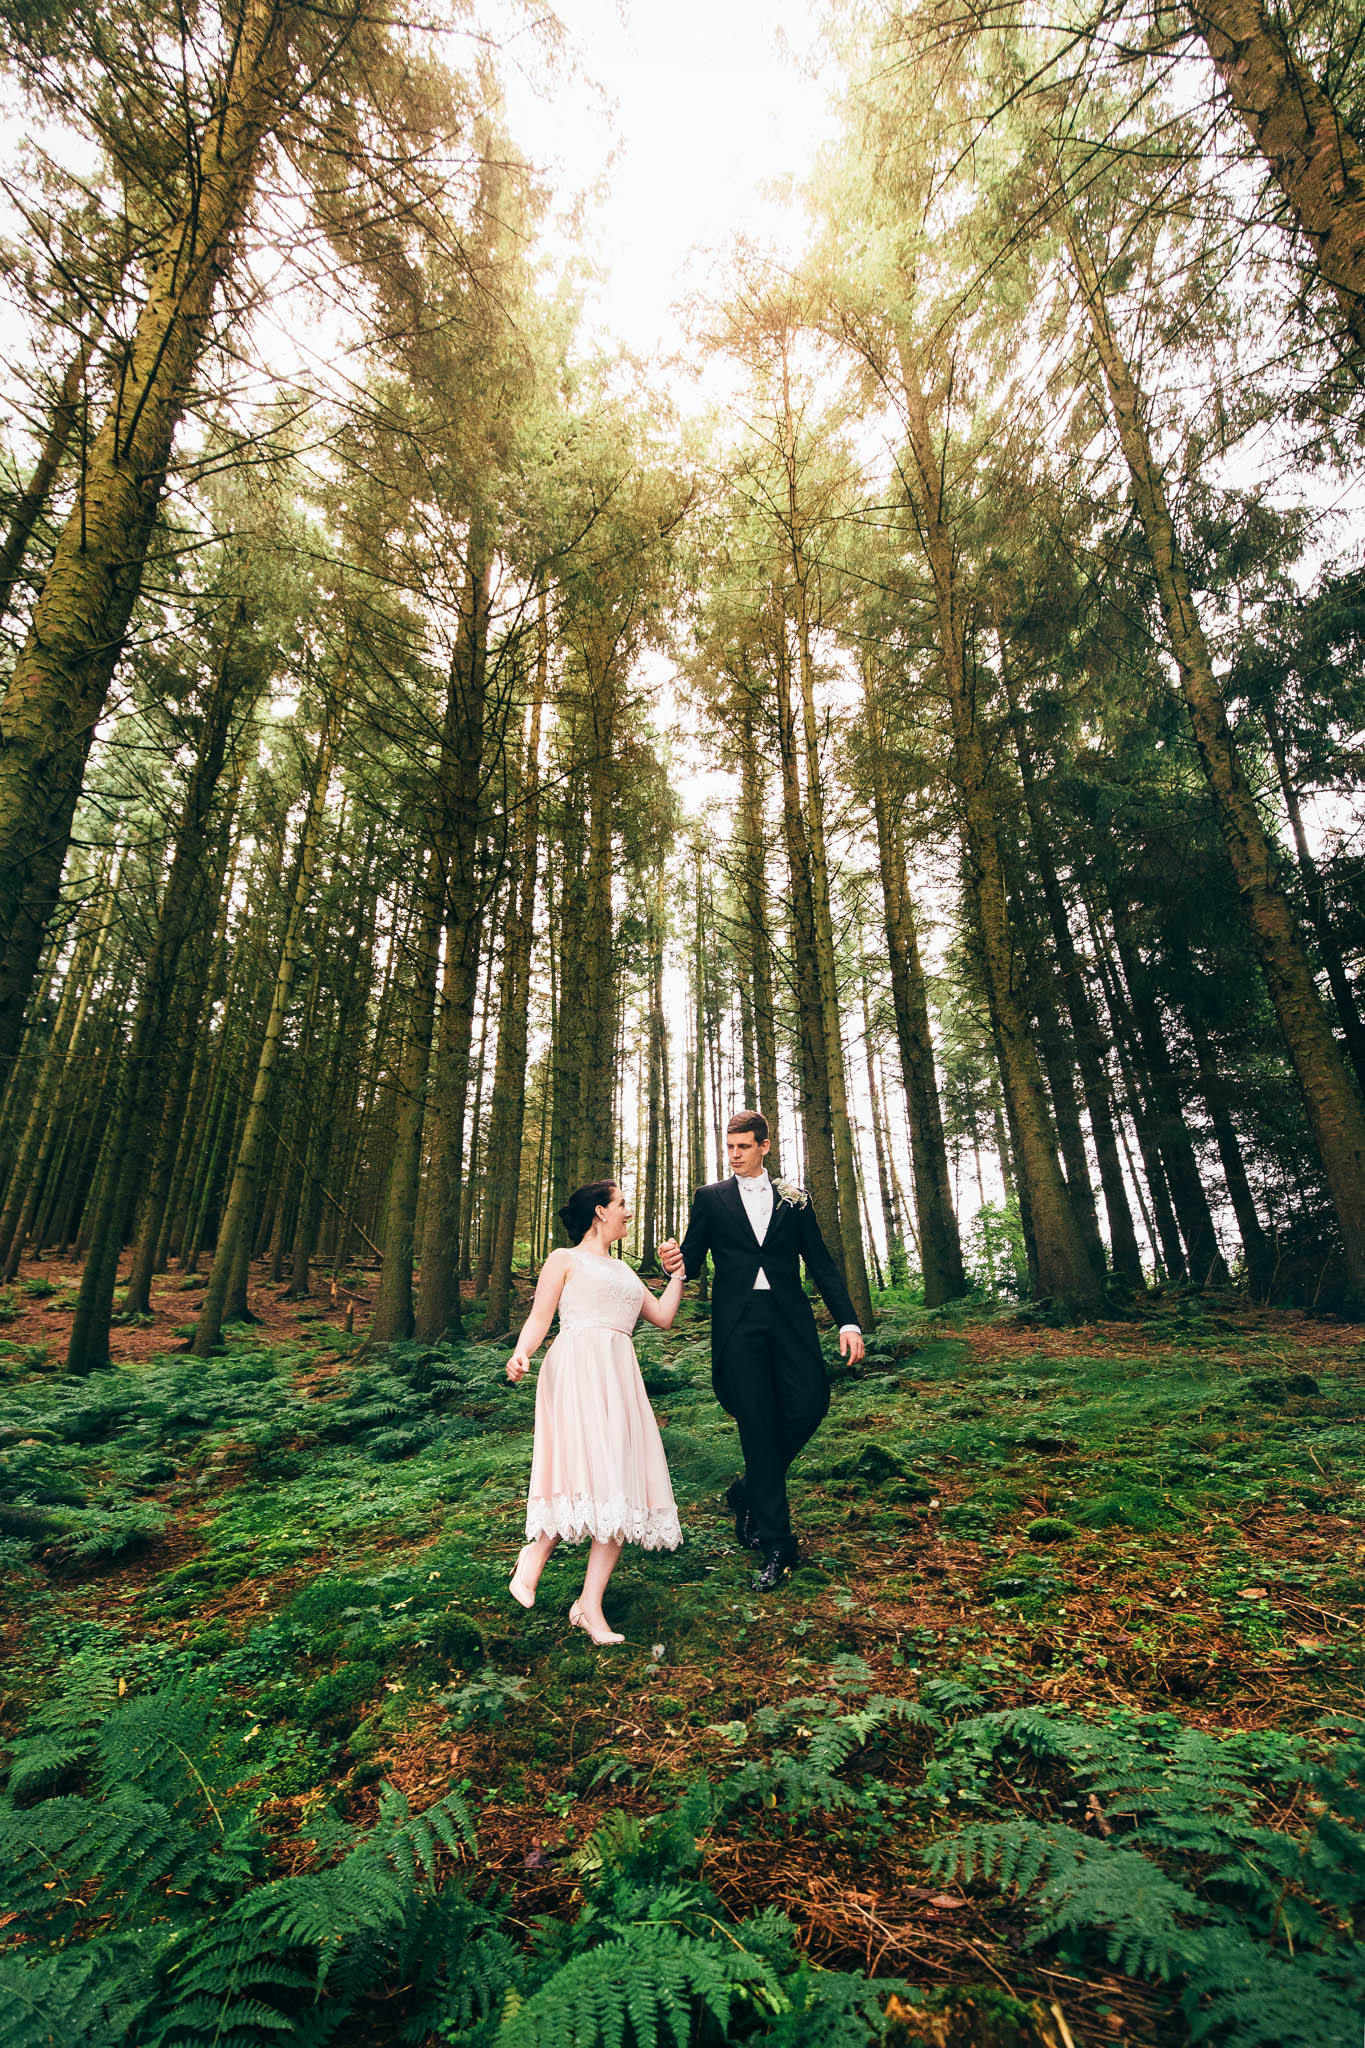 Norway+wedding+photographer+elopement+pre+wedding+Rogaland+bryllupsfotograf+Casey+Arneson-110.jpg